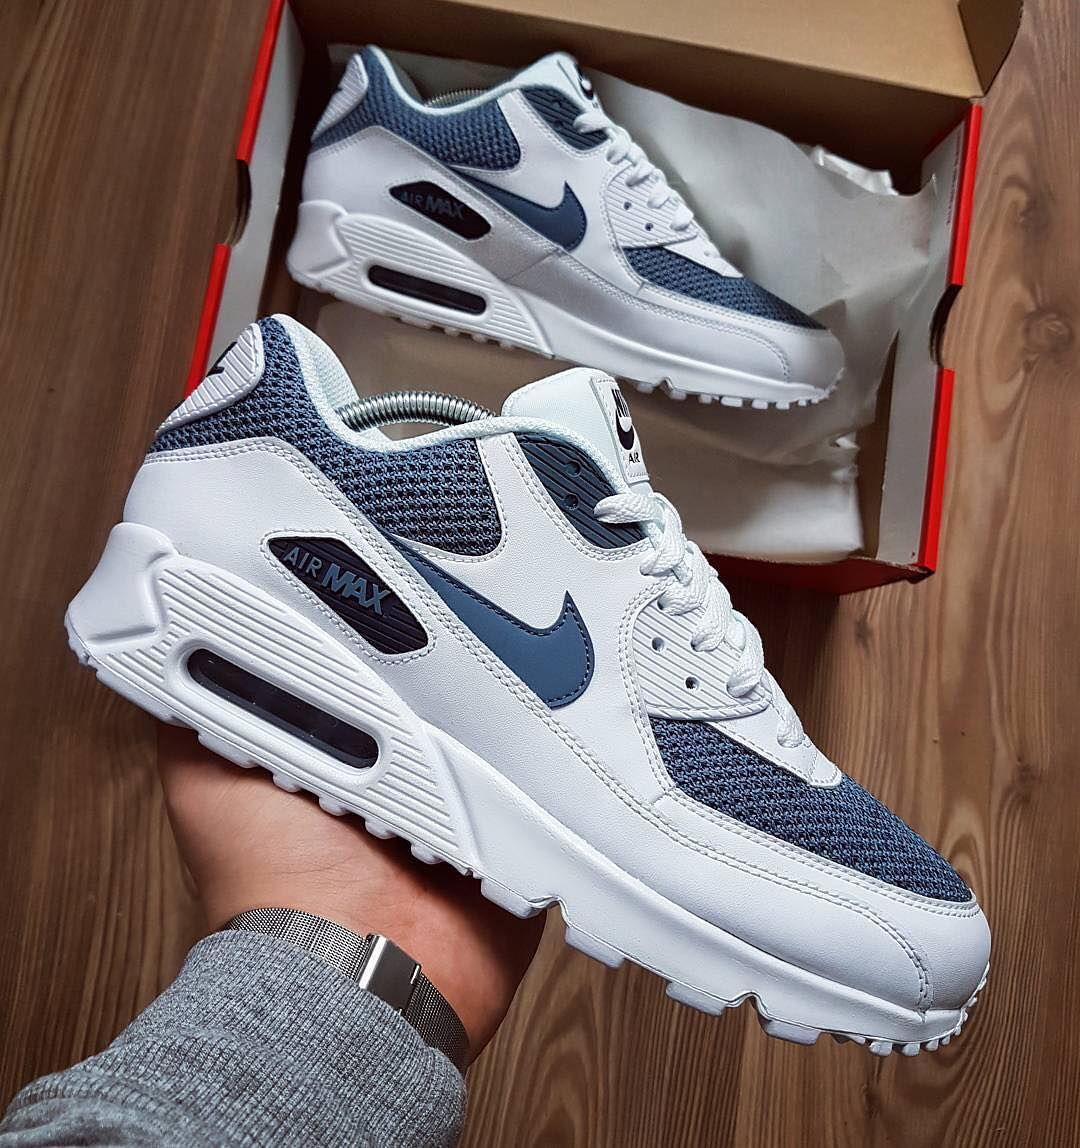 Fashion Shoes | Nike air max, Nike air max 90s, Sneakers fashion